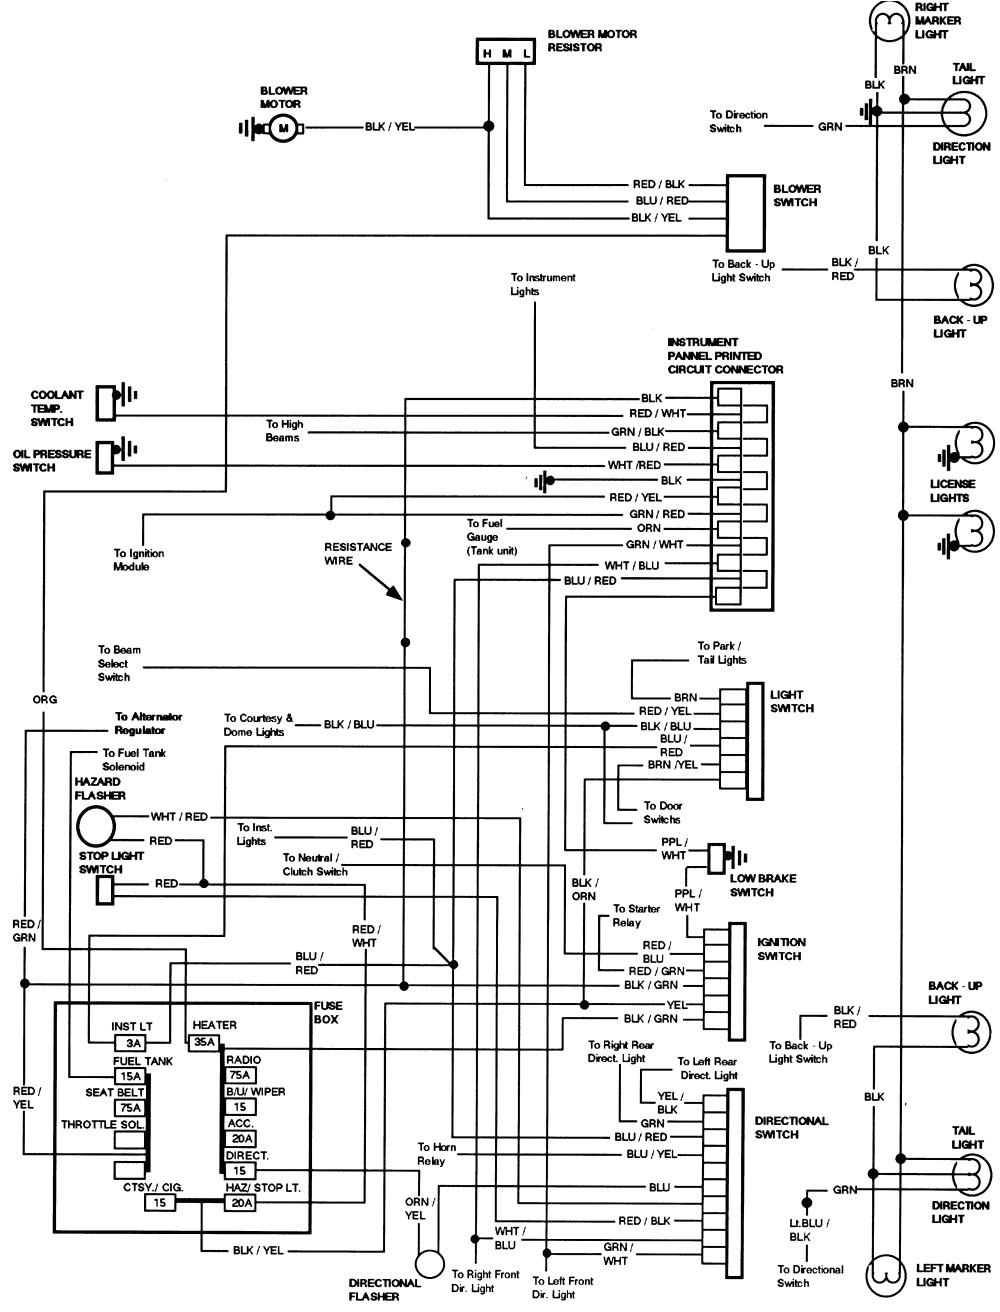 79 ford f 250 wiring wiring diagram database blog 1979 ford f 250 distributor wiring